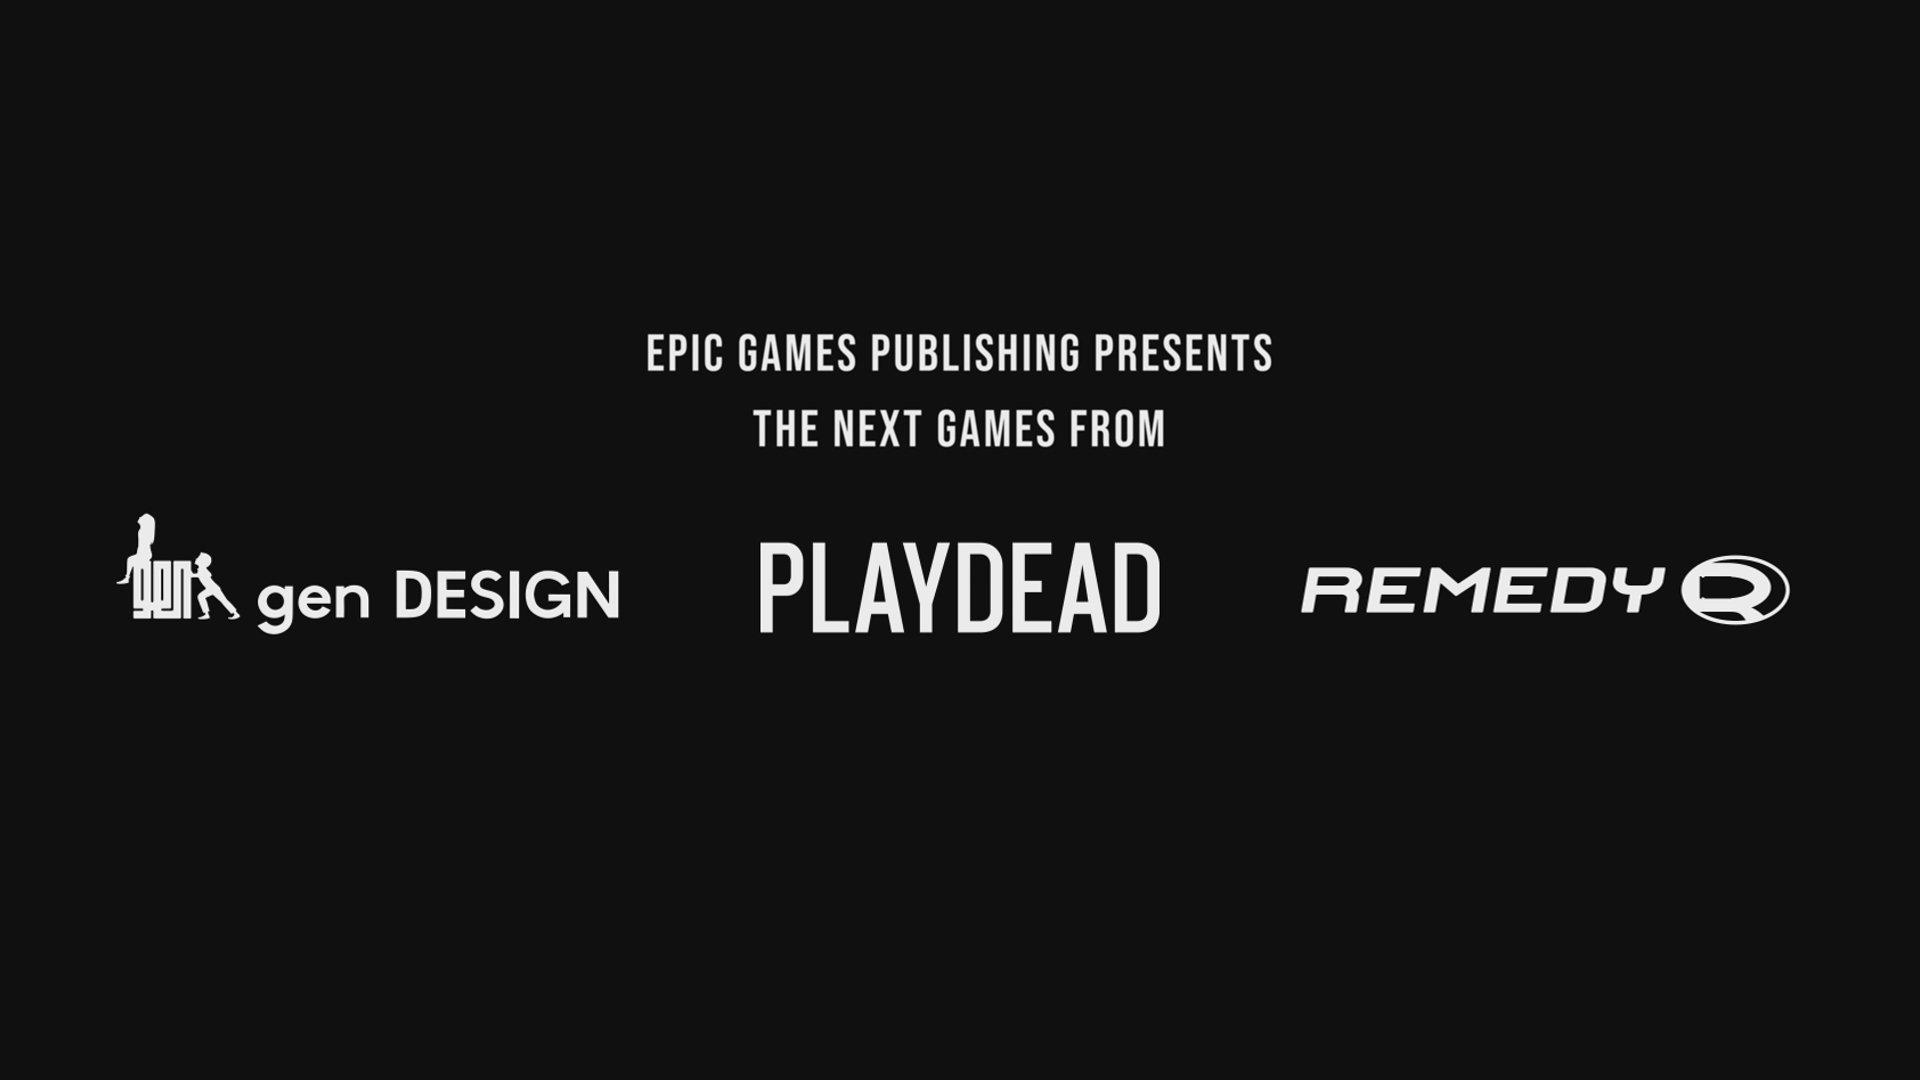 epic-games-publishing.jpg